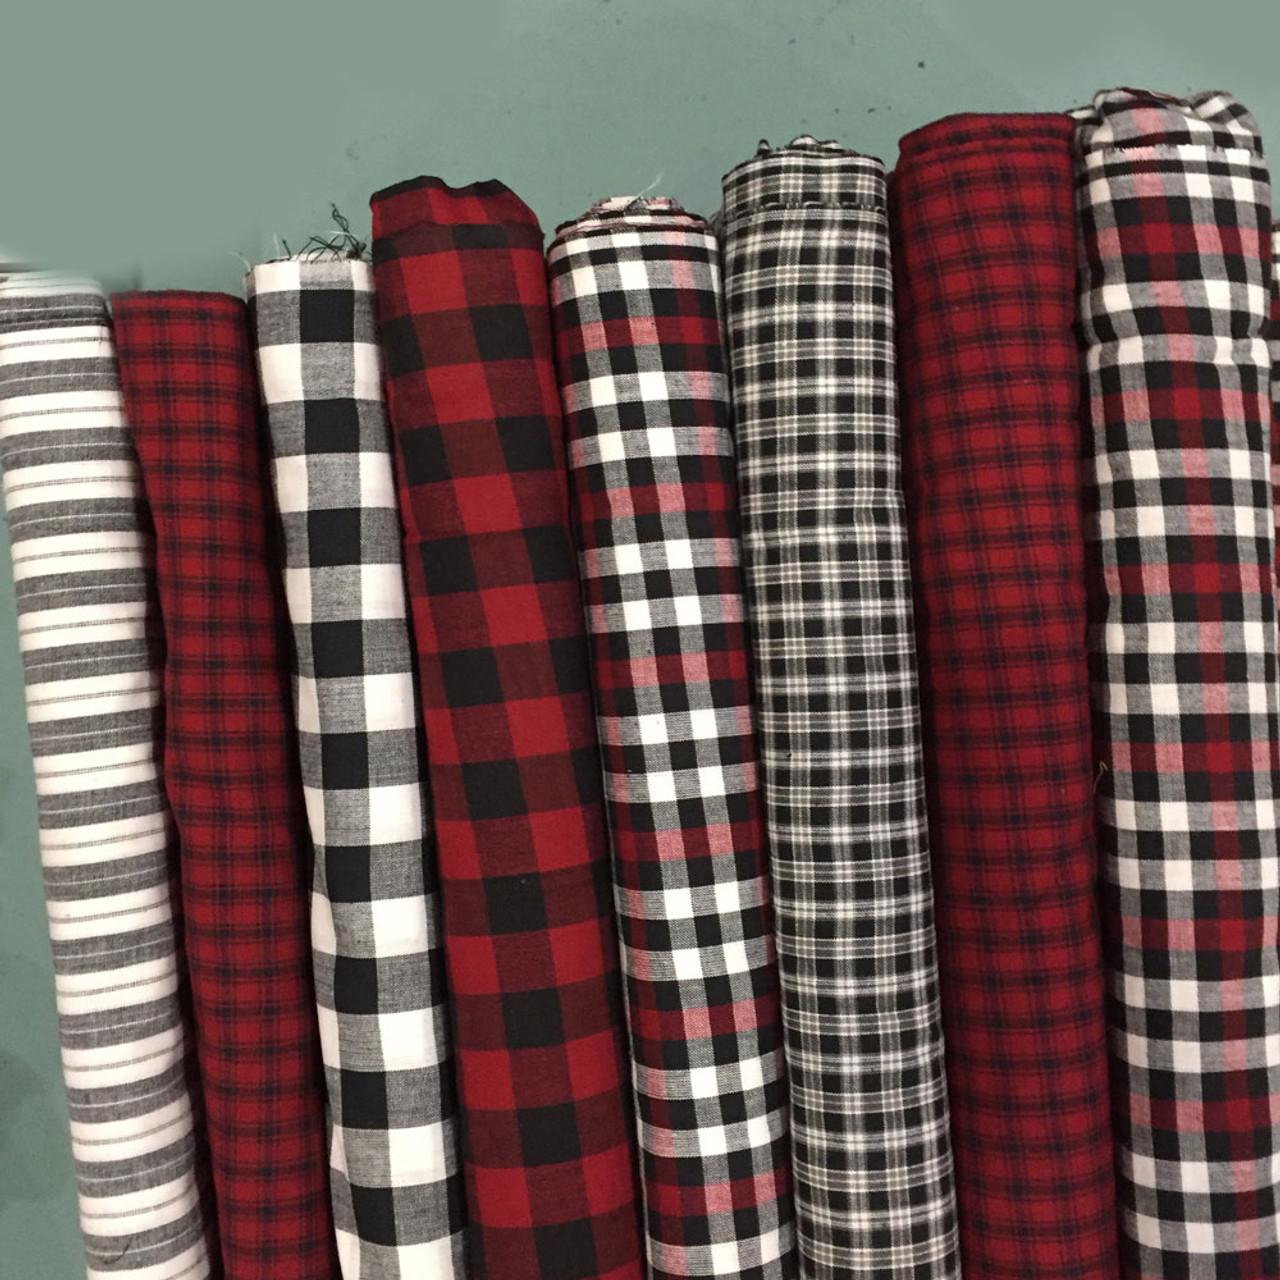 Buffalo Lodge Plaid Ragged Christmas Tree Skirt Kit